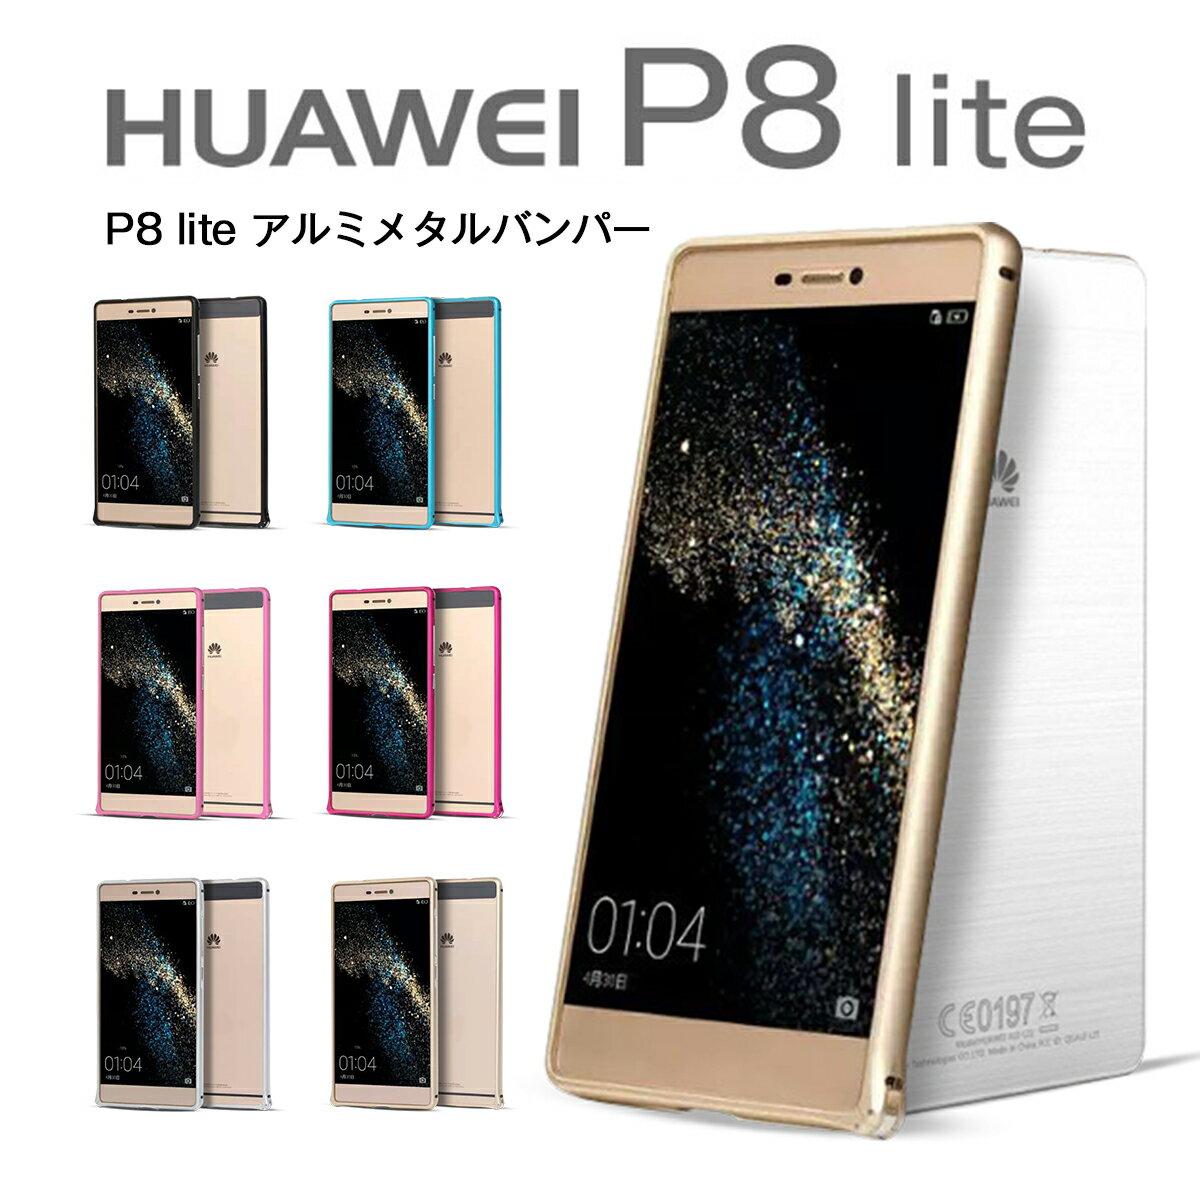 HUAWEI P8 Lite アルミメタルバンパー | スマホ ケース スマホ カバー 側面保護 メタルバンパー アルミ 軽量 簡単装着 工具不要 バックル式 Android アンドロイド 1000円 送料無料 ポッキリ 1,000円